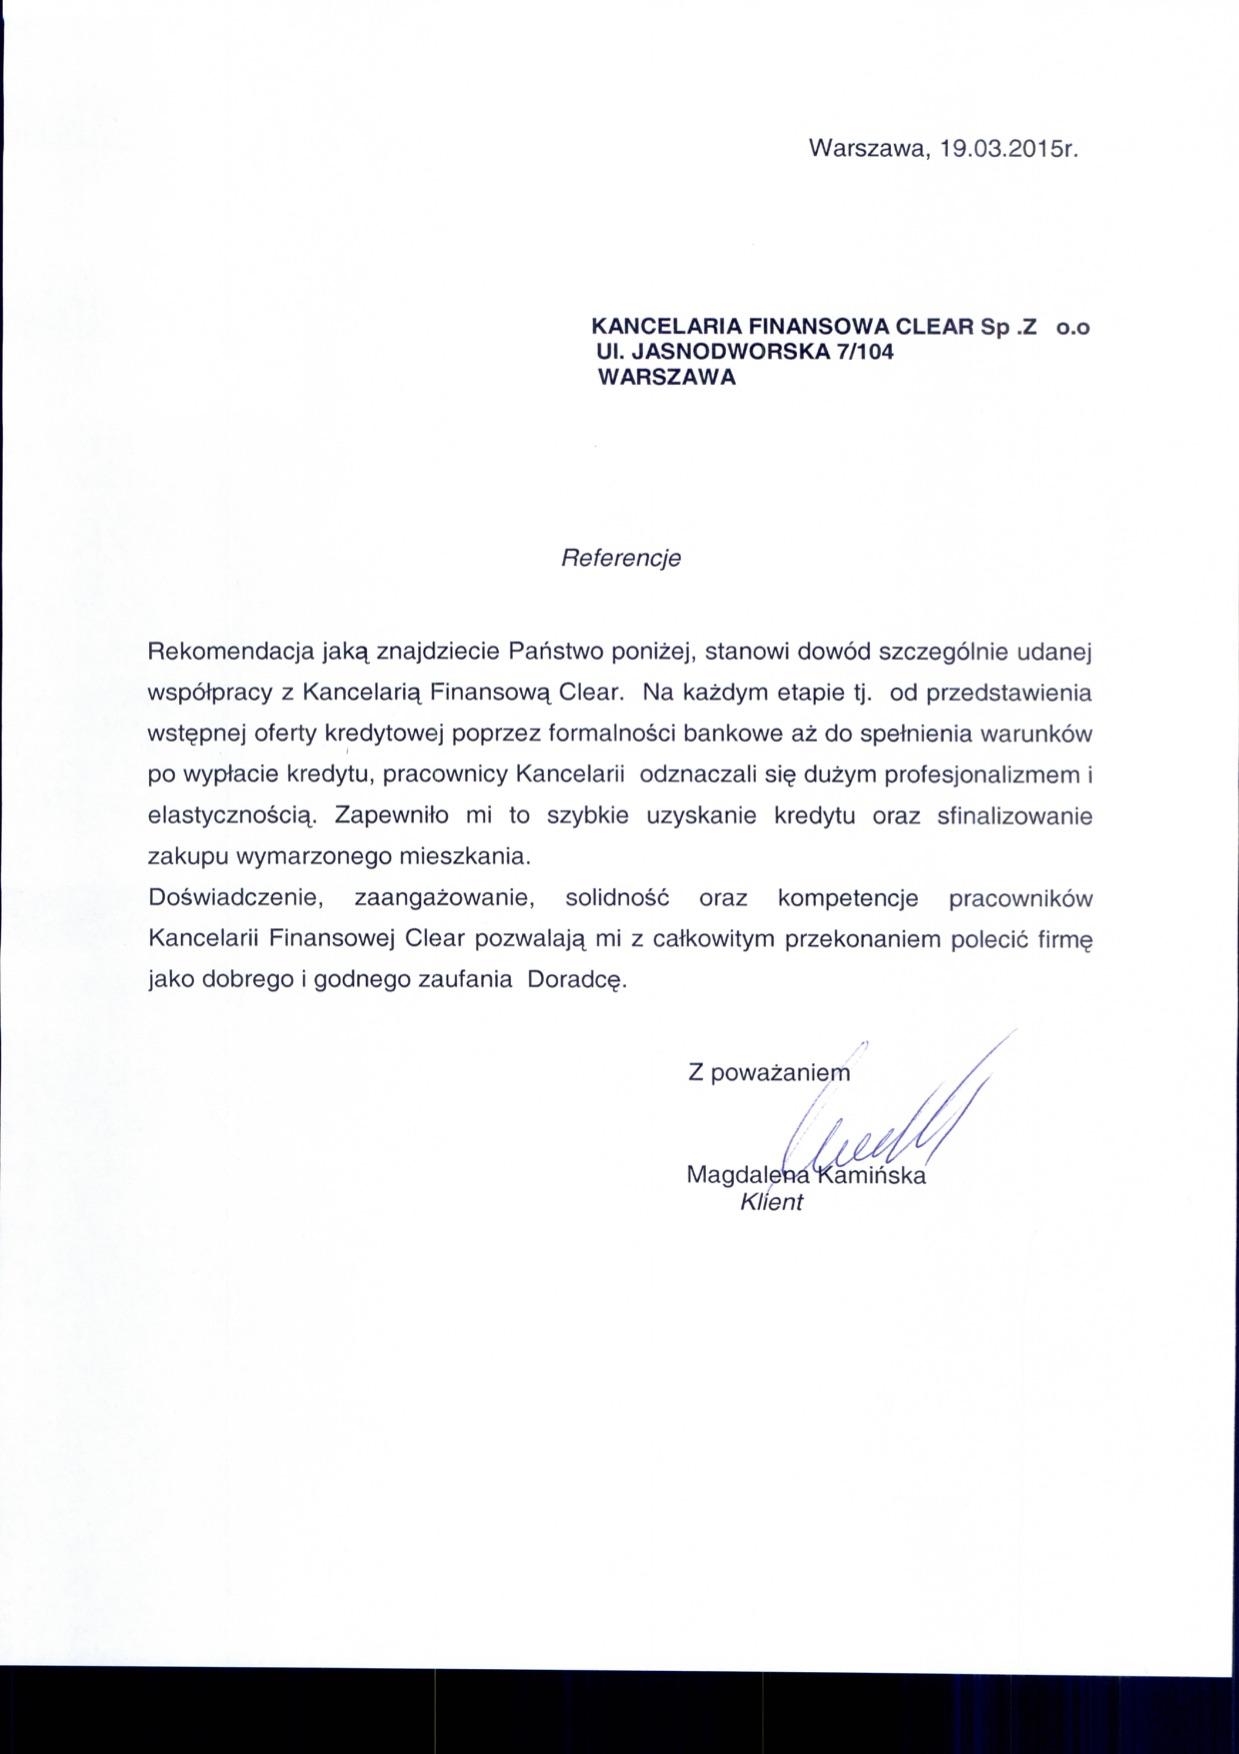 referencje dla kancelarii clear od Magdalena Kamińska